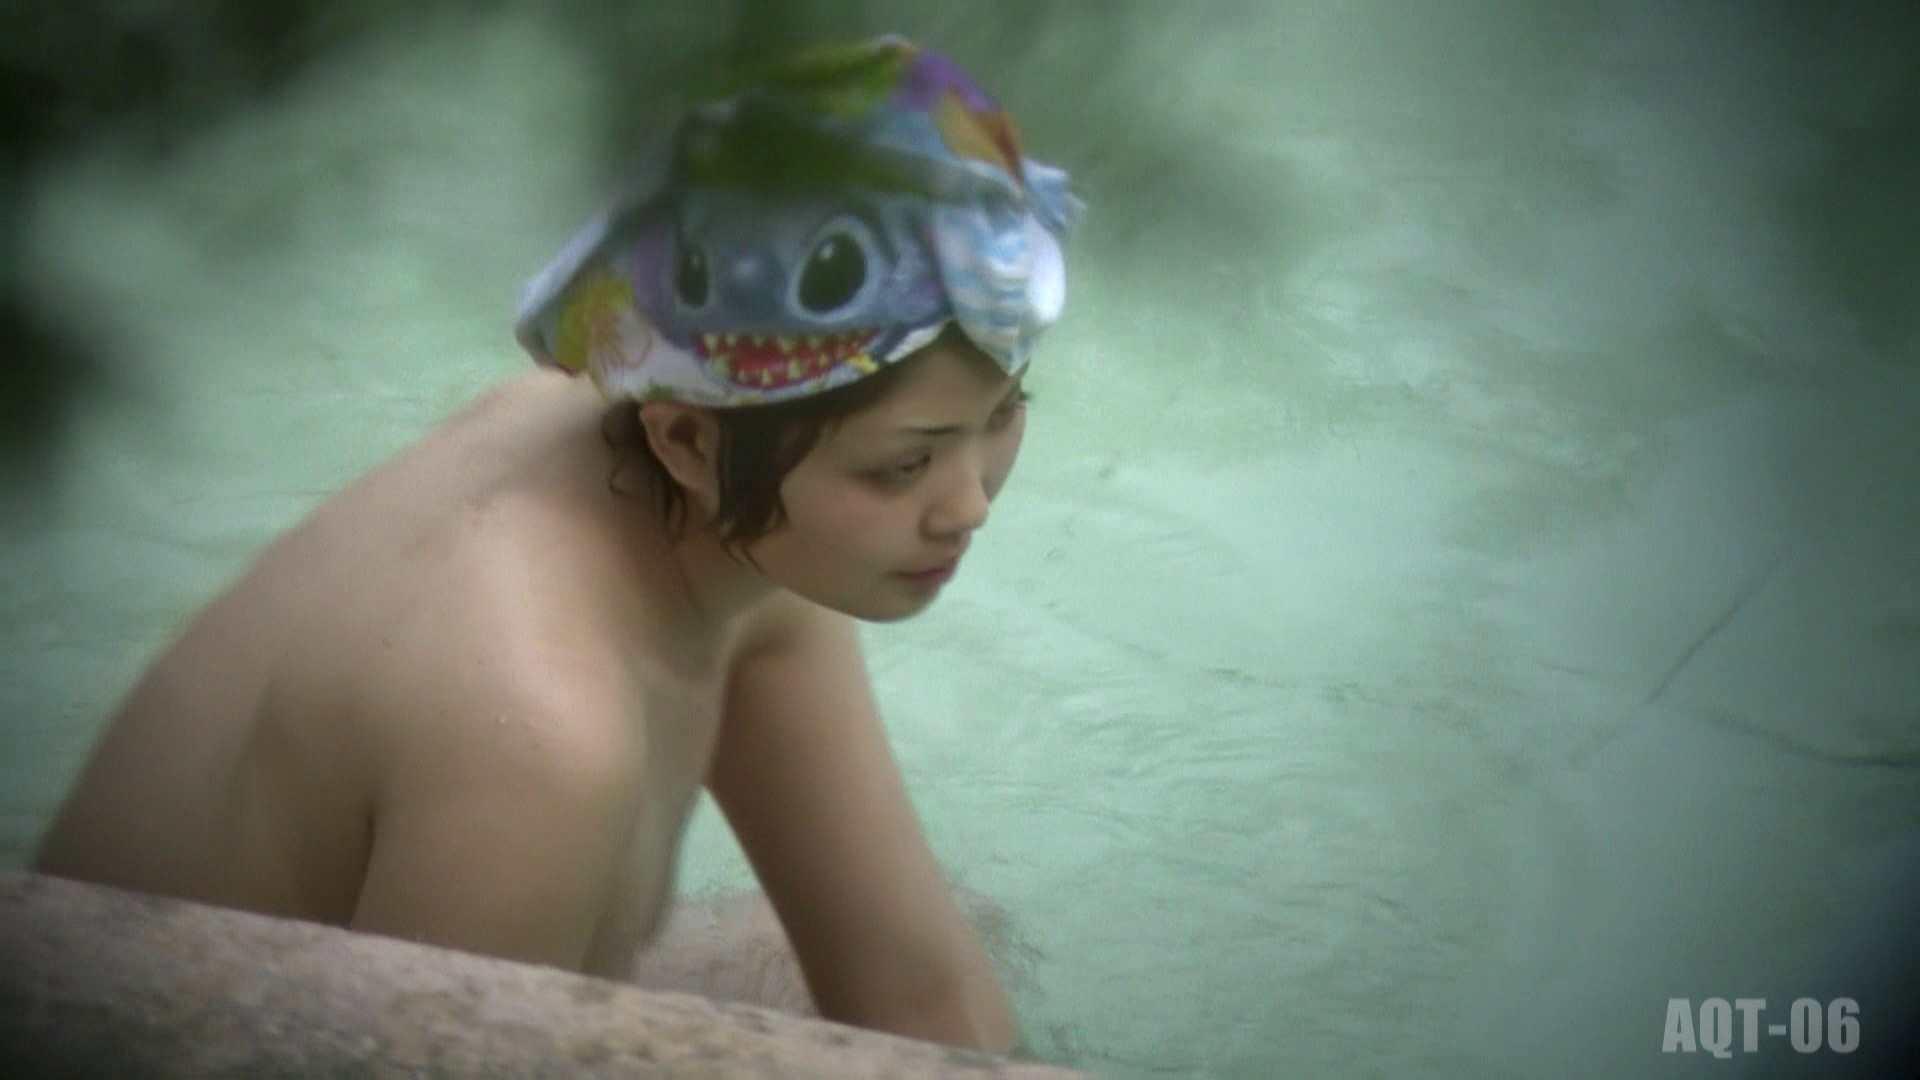 Aquaな露天風呂Vol.761 盗撮 オマンコ無修正動画無料 97連発 95